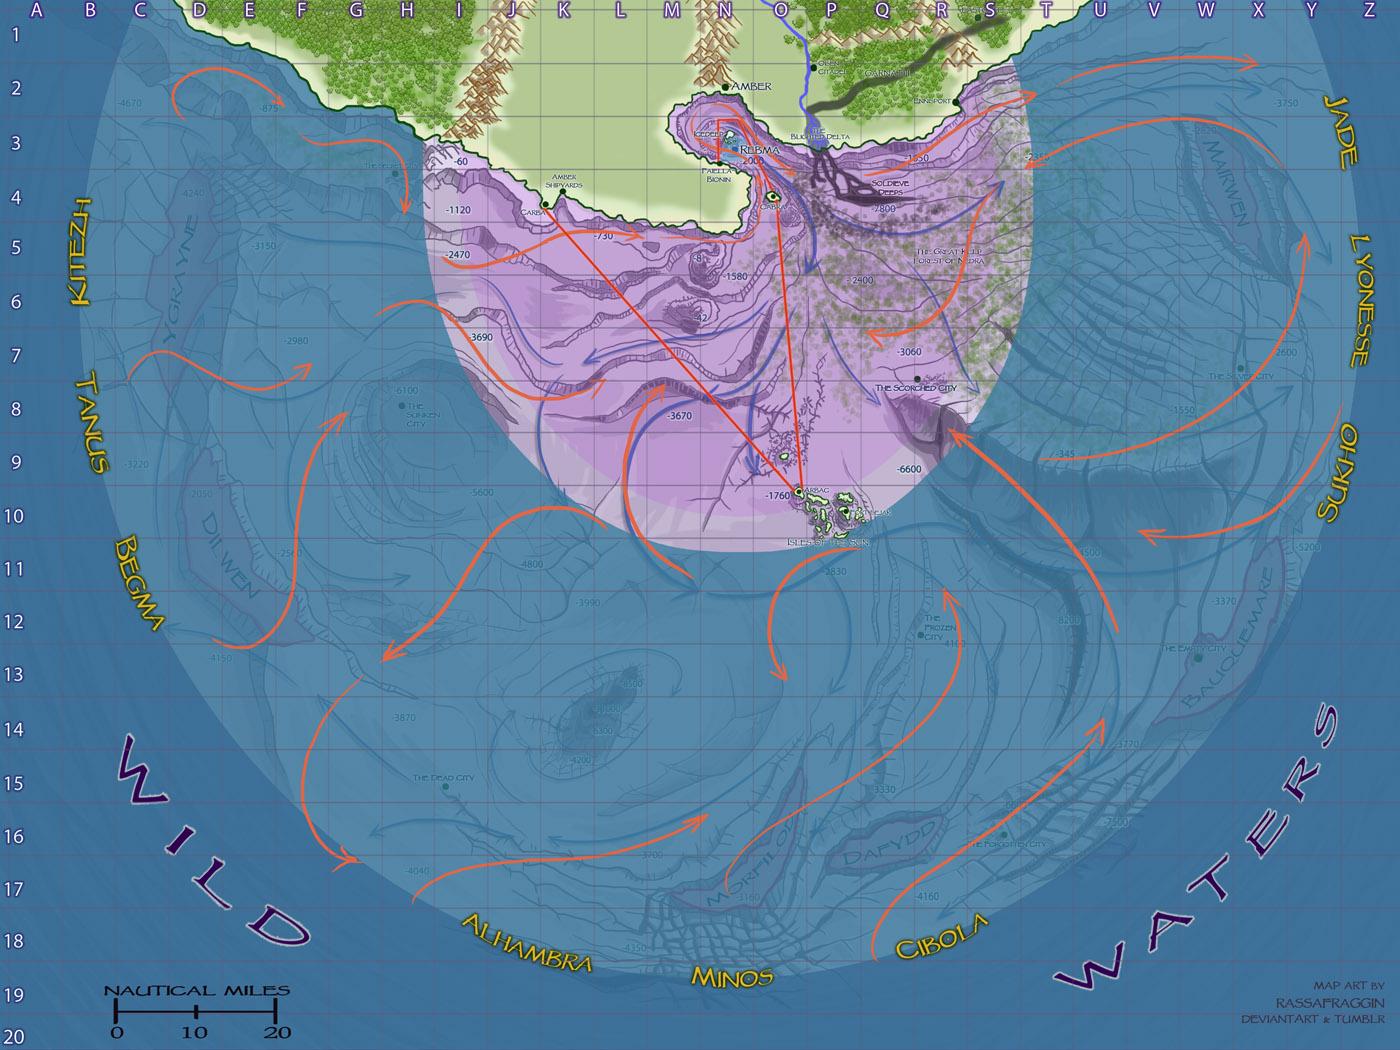 Rebma_Oceanography_Map_Obscura.jpg